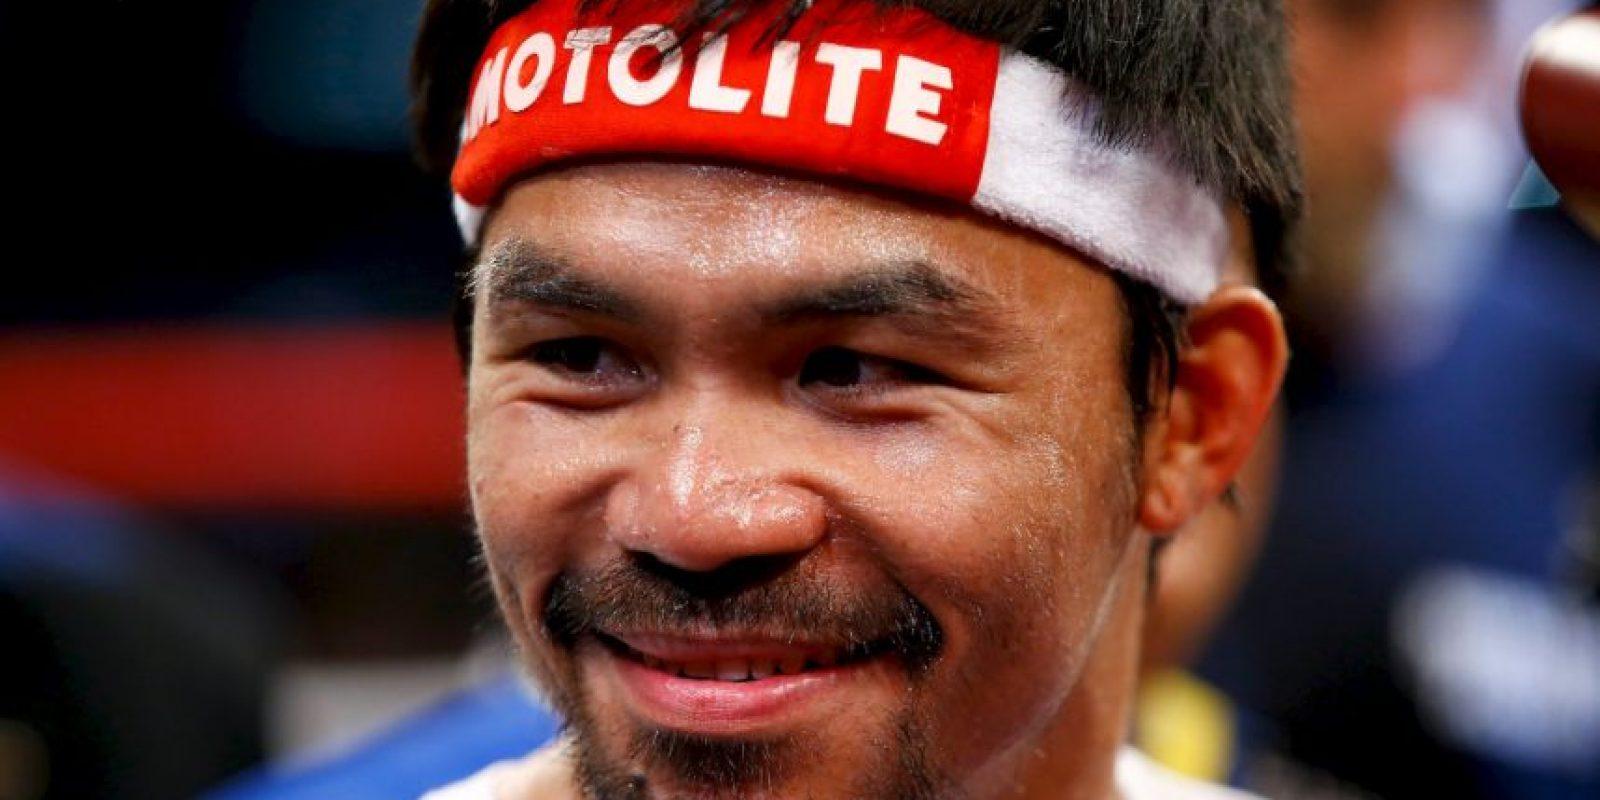 El filipino antes de iniciar el combate Foto:Getty Images